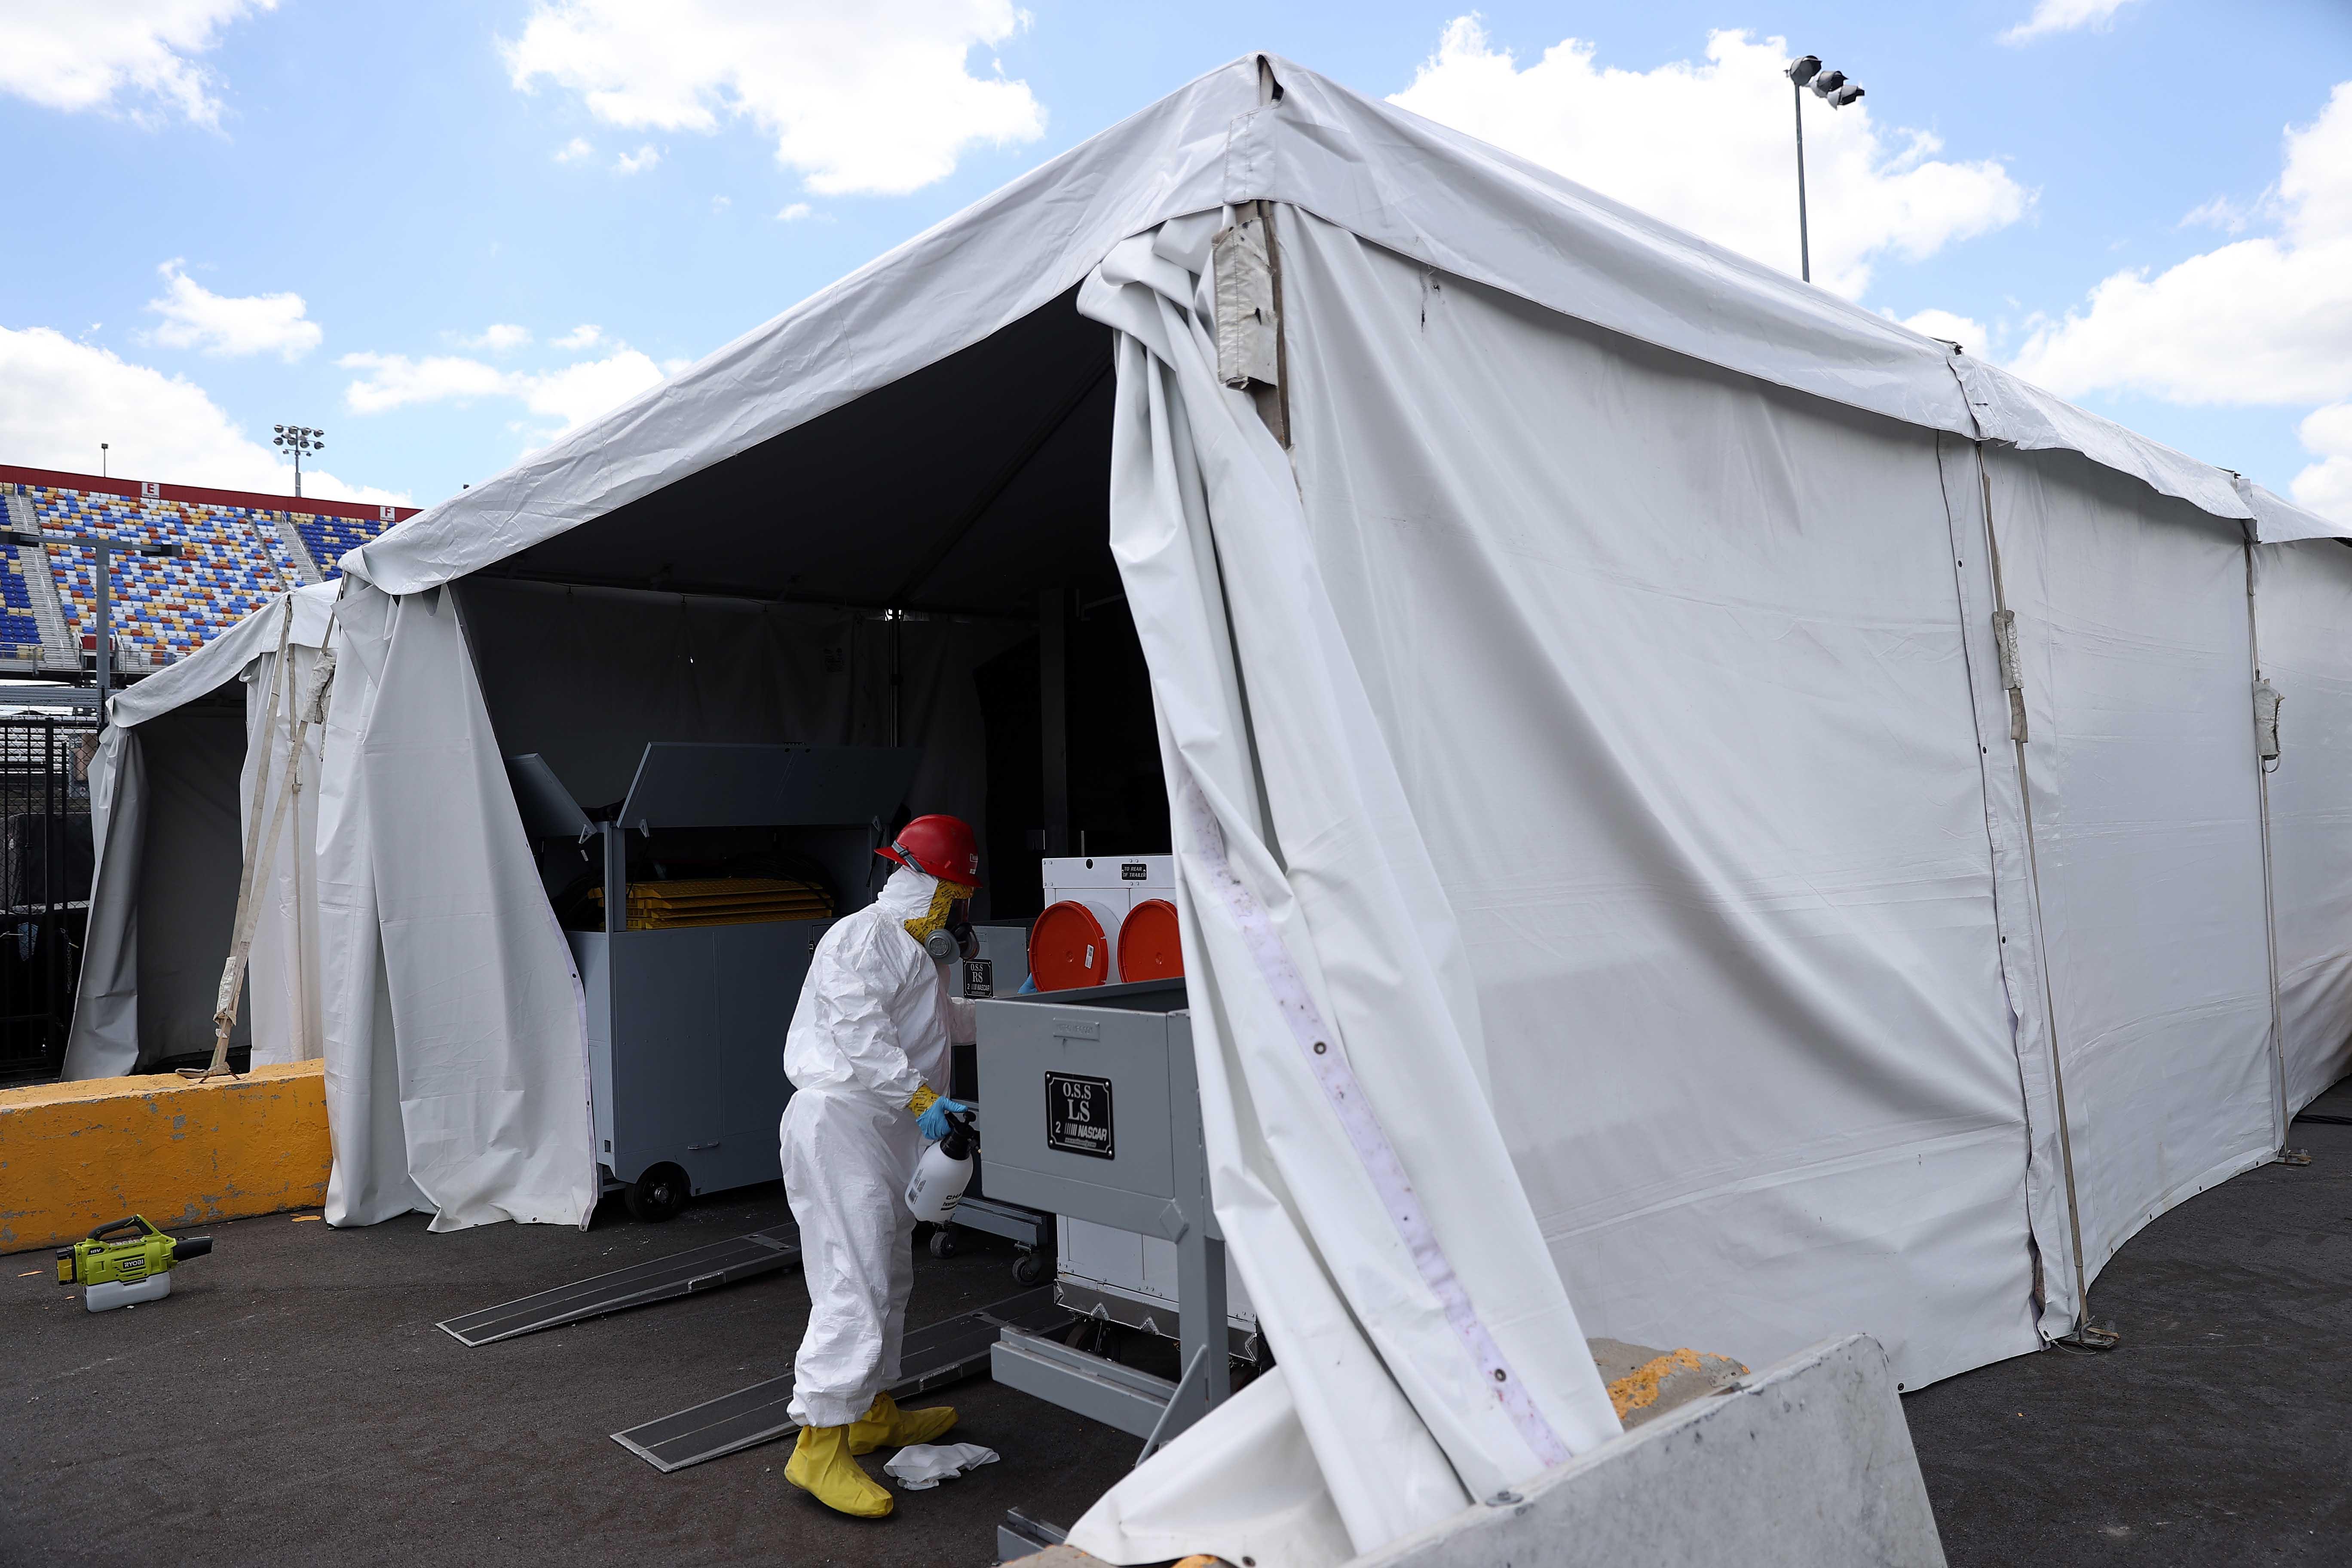 NASCAR OSS Inspection tent - Coronavirus cleaning at Darlington Raceway